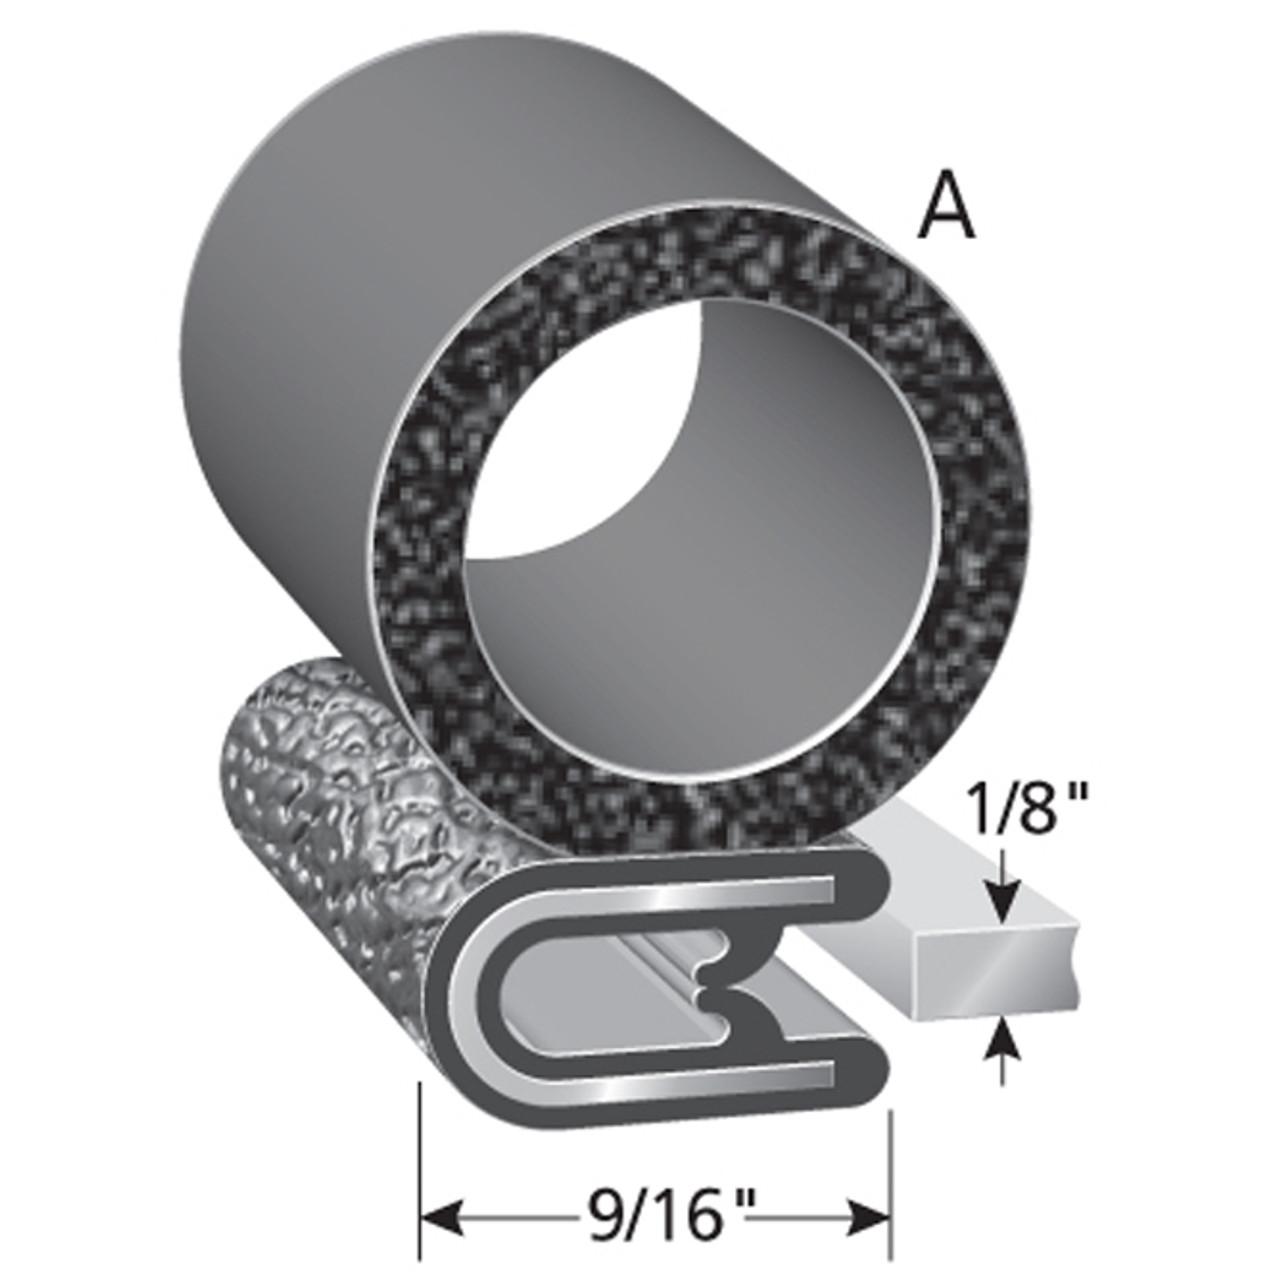 "Bulb Location ""A"" /  Bulb Diameter - 3/4"" Across /  Fits up to a 1/8"" Edge /  Trim Leg Length of 9/16"""